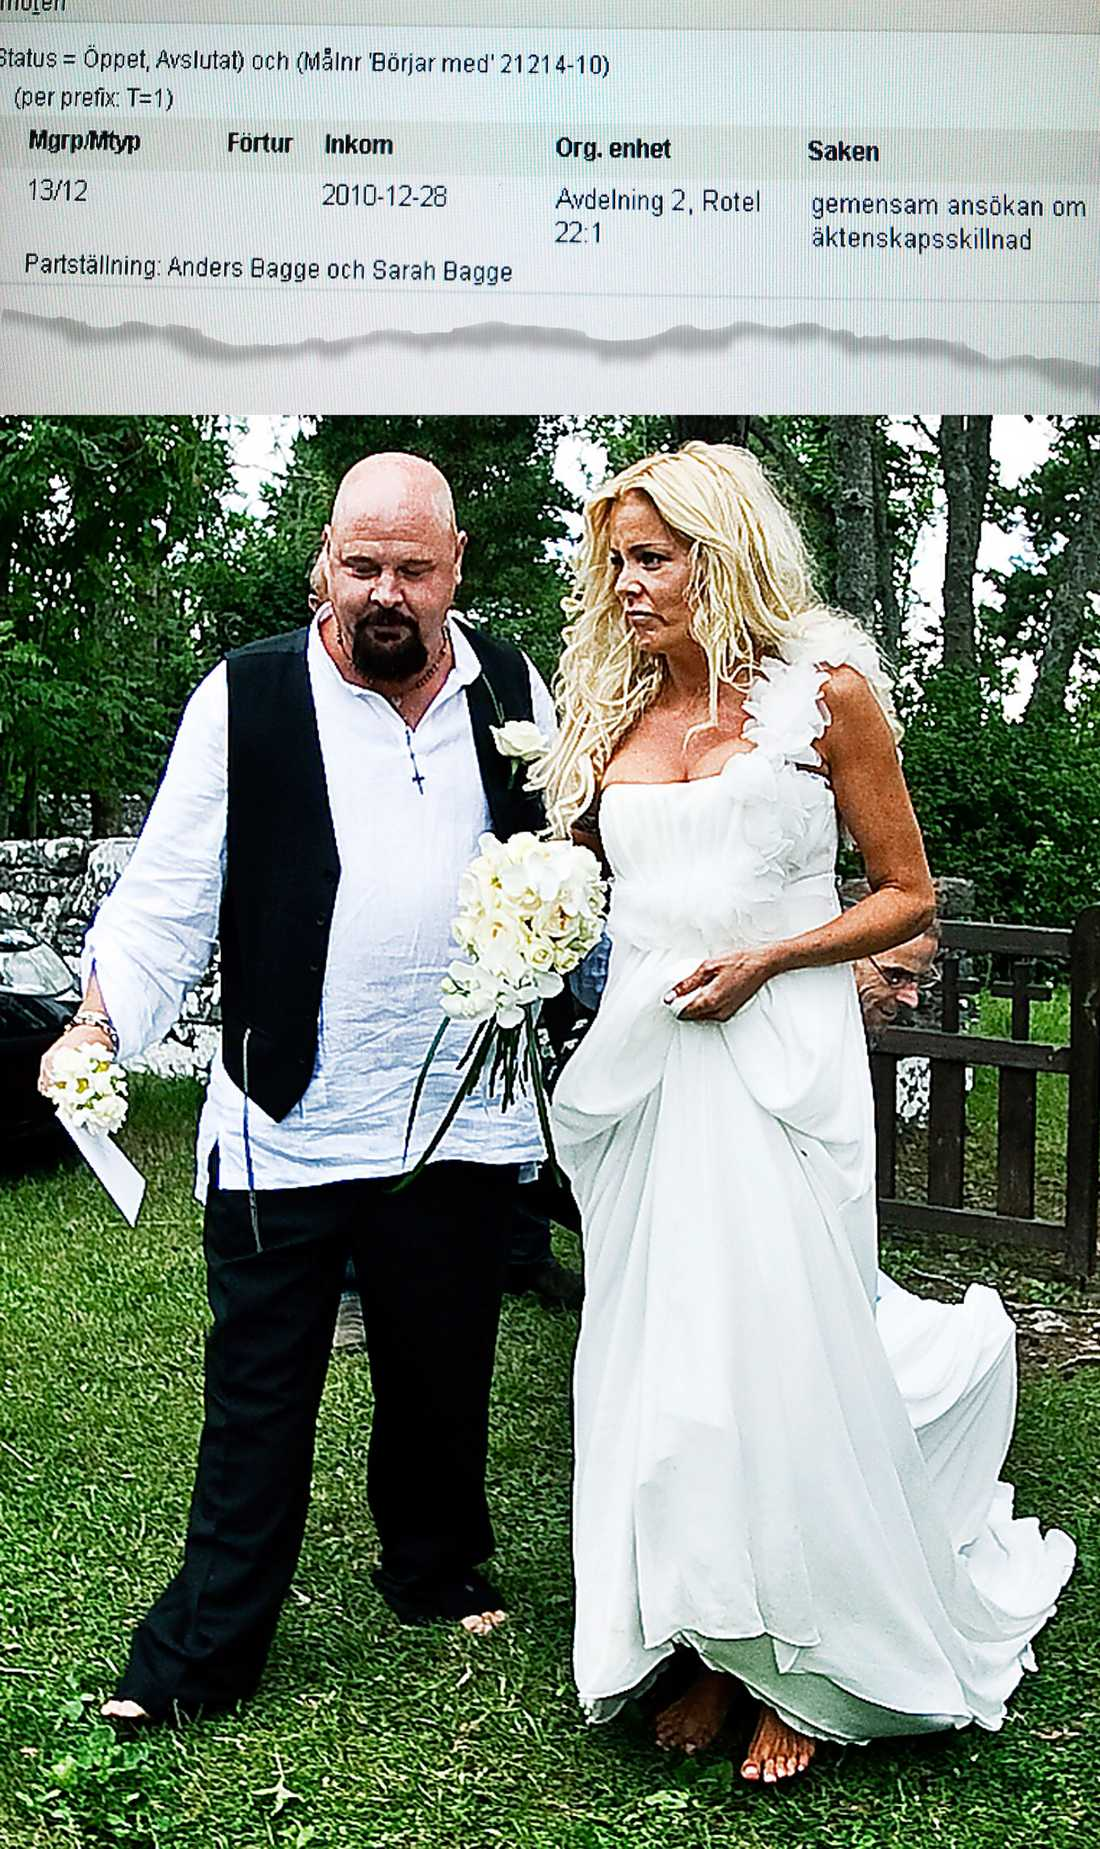 SOMMARBRÖLLOP Anders Bagge och Sarah Johansson gifte sig på norra Gotland i somras.